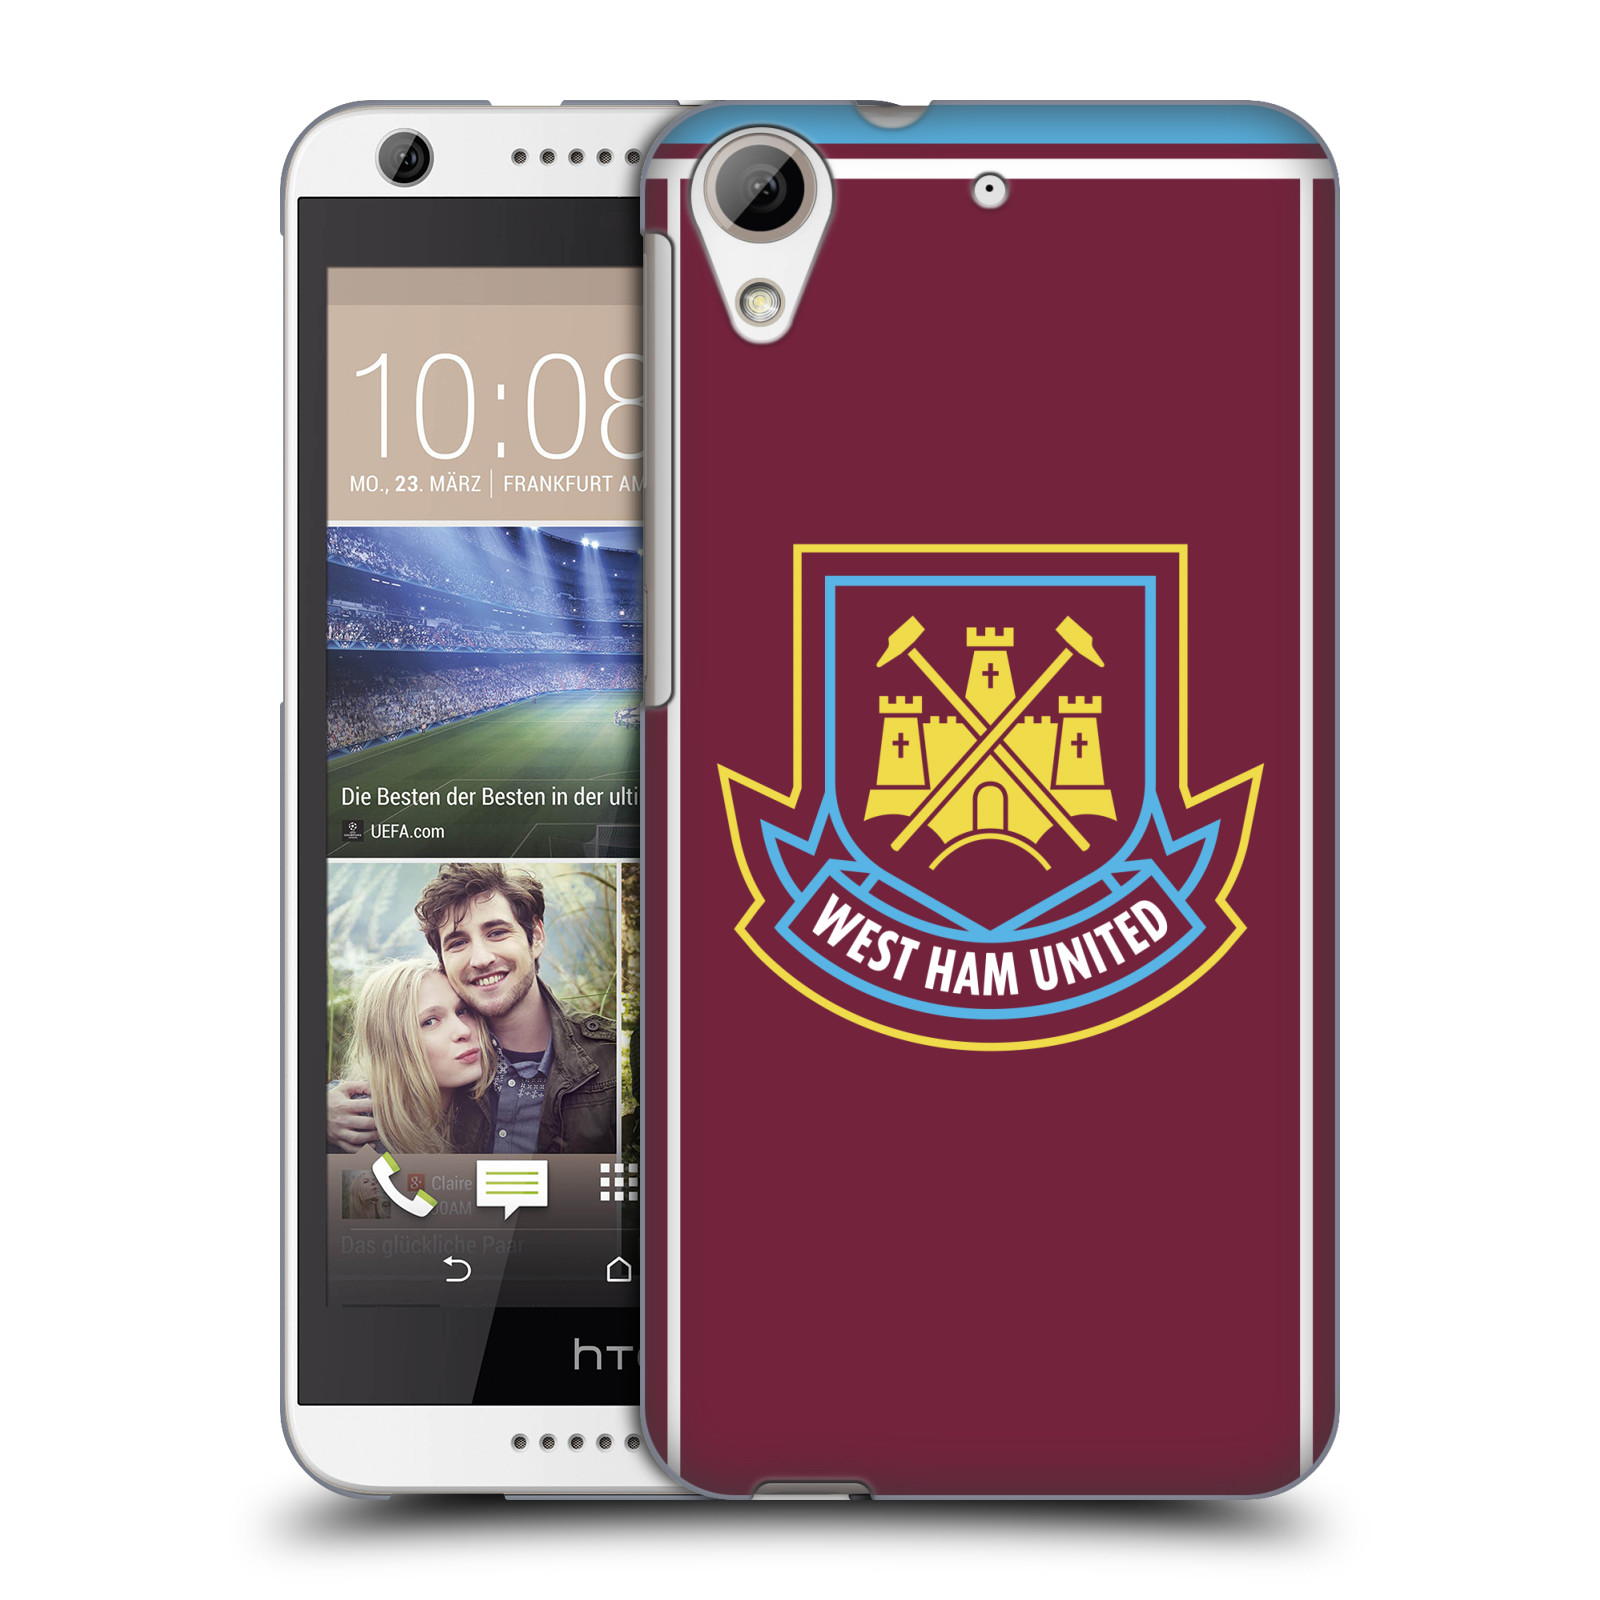 Plastové pouzdro na mobil HTC Desire 626 / 626G - Head Case - West Ham United - Retro znak